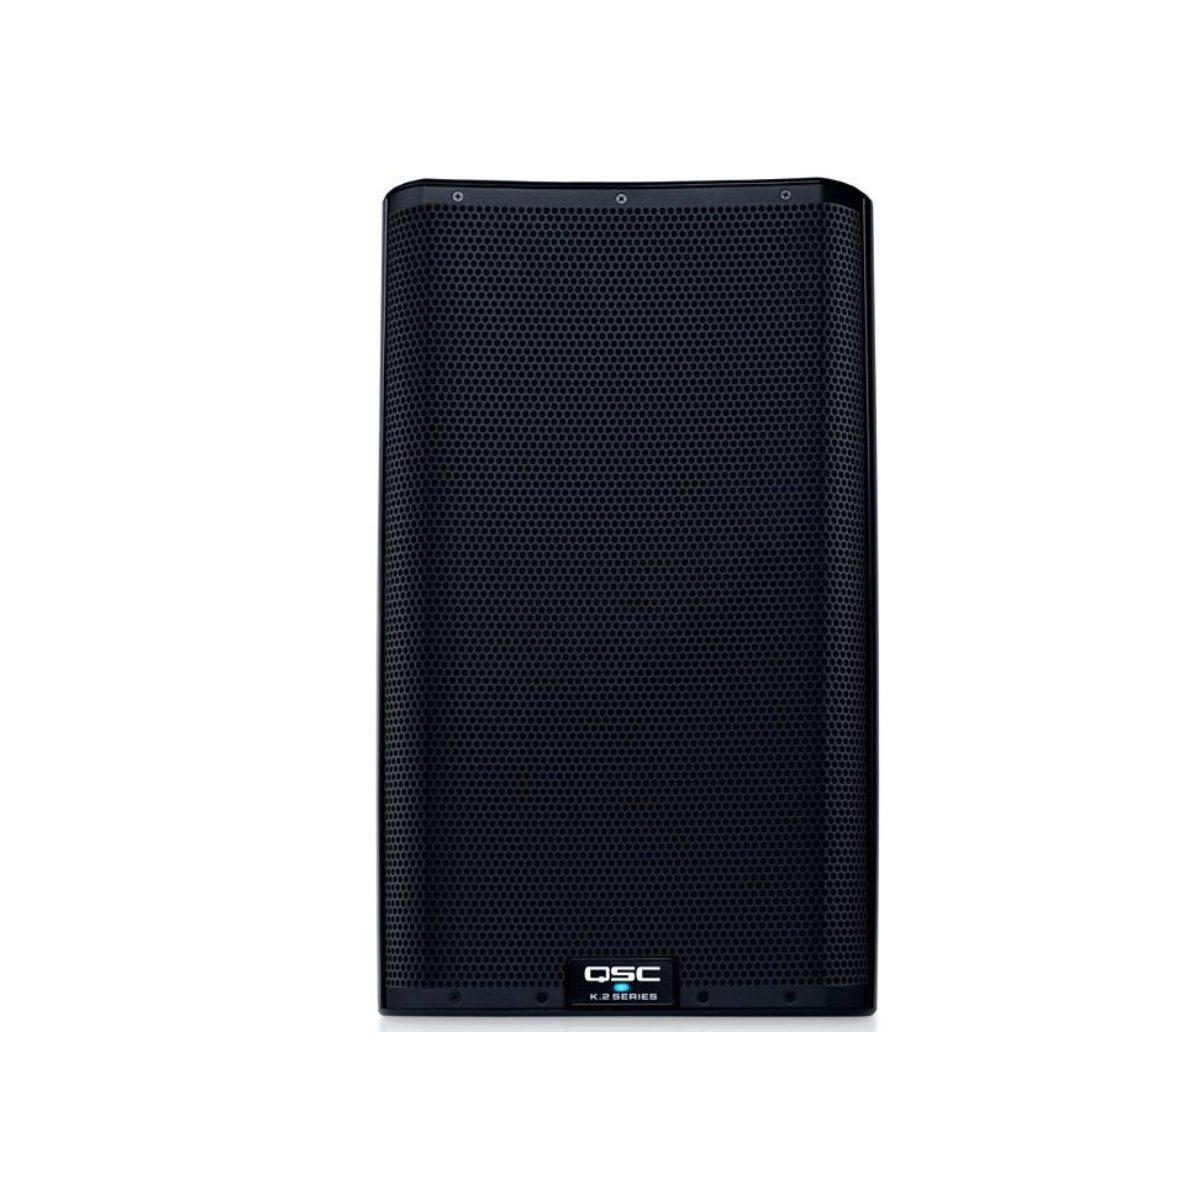 Caixa acústica amplificada K12.2 - K.2 Series - QSC